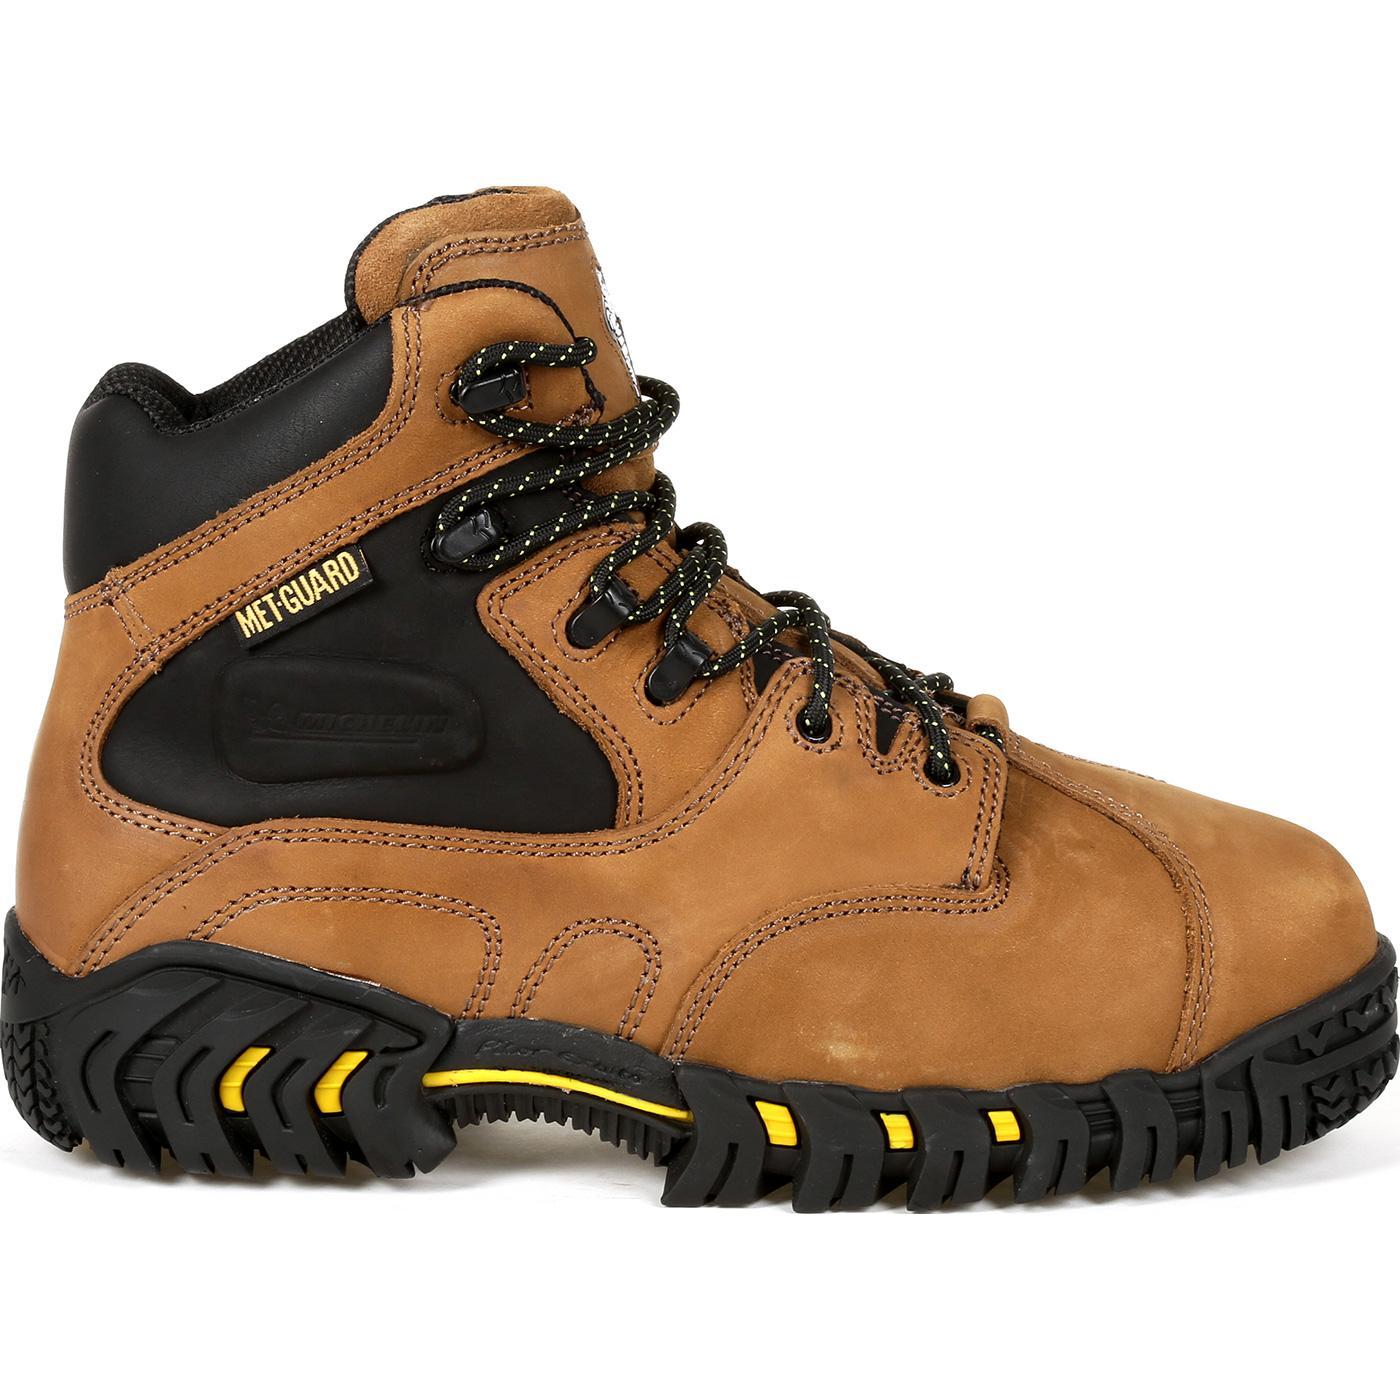 6b7942afbed0fd Michelin® Men's Metatarsal Guard Steel Toe Work Boot - XPX763